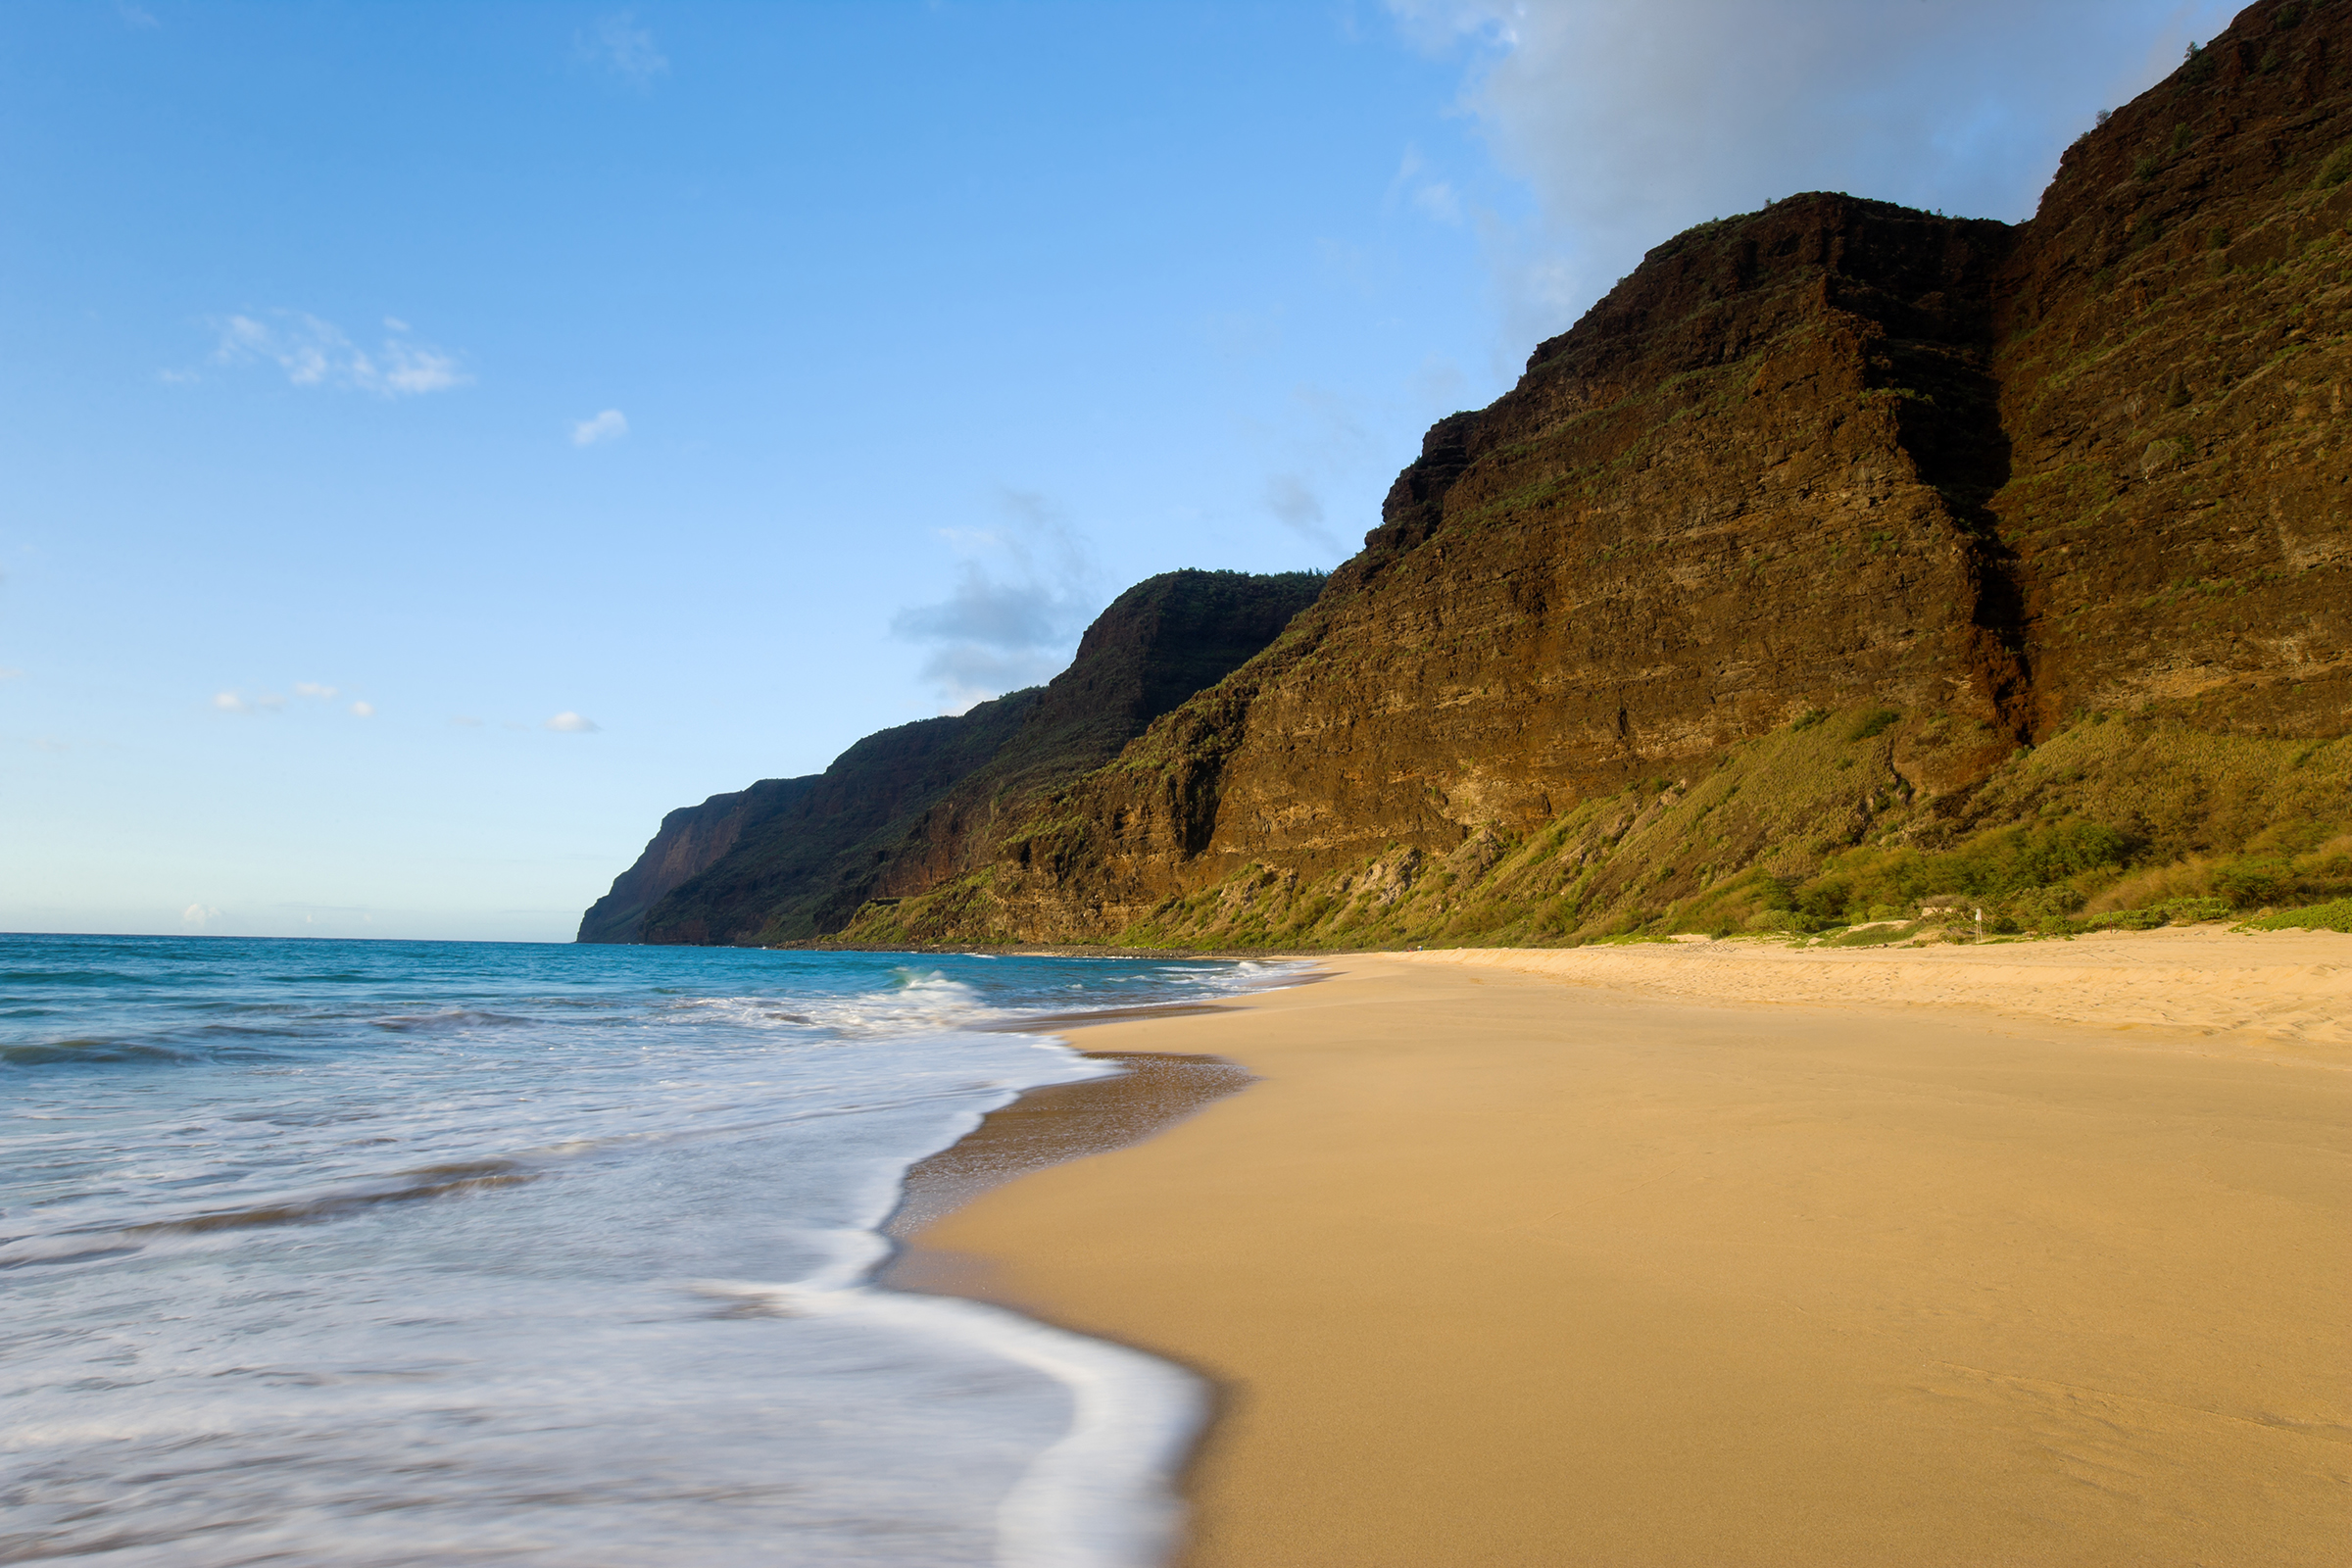 Il meglio per pace e tranquillit Polihale Beach Kauai Hawaii